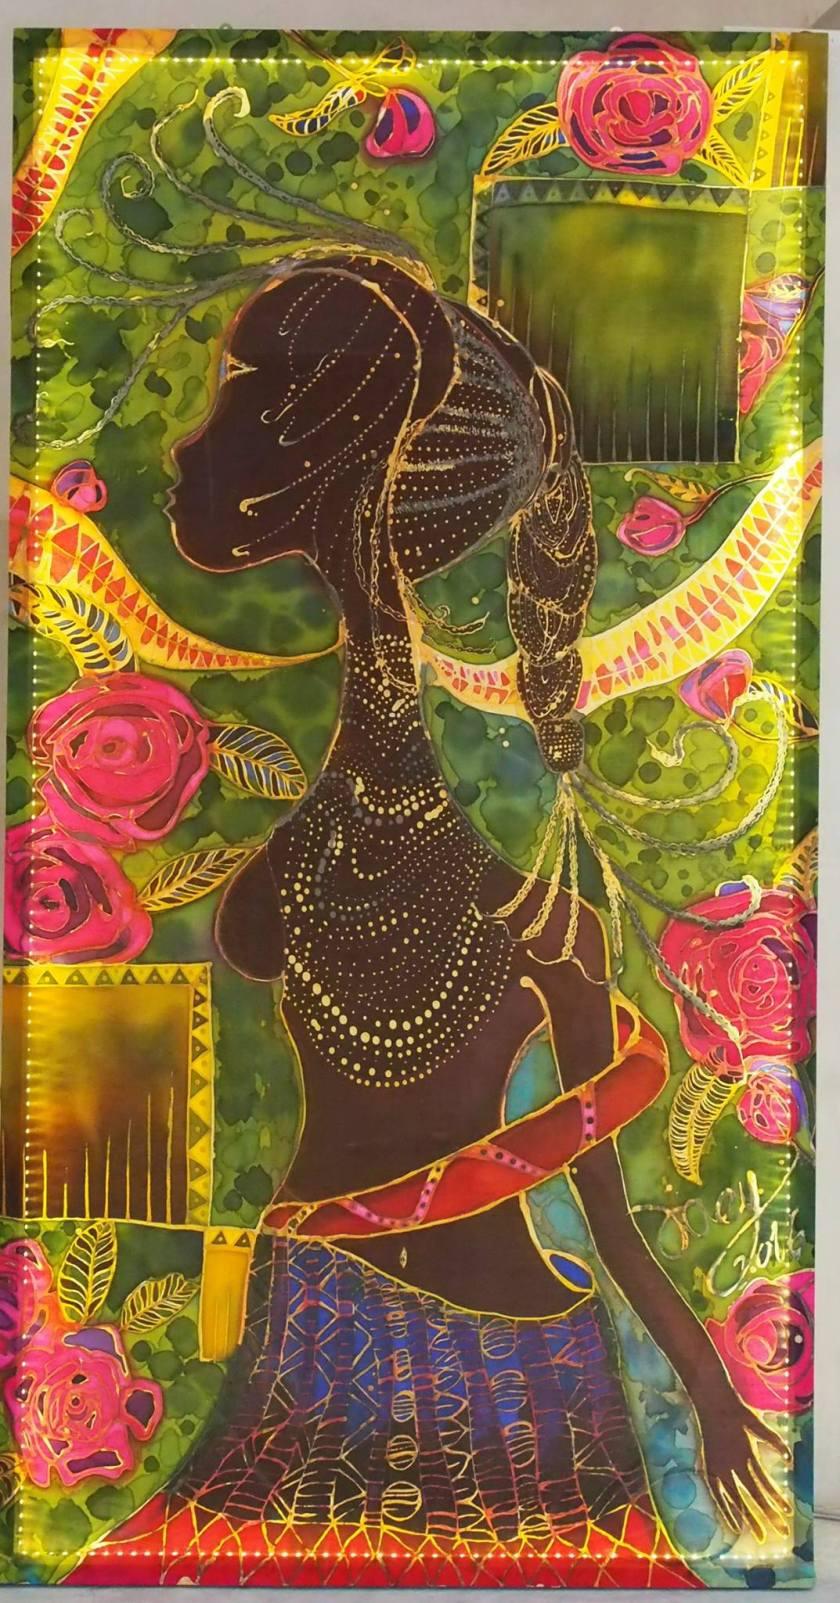 joey-kher-batik-aotu-exhibition-black-beauty-no-3-artwork-for-music-festival-batu-pahat